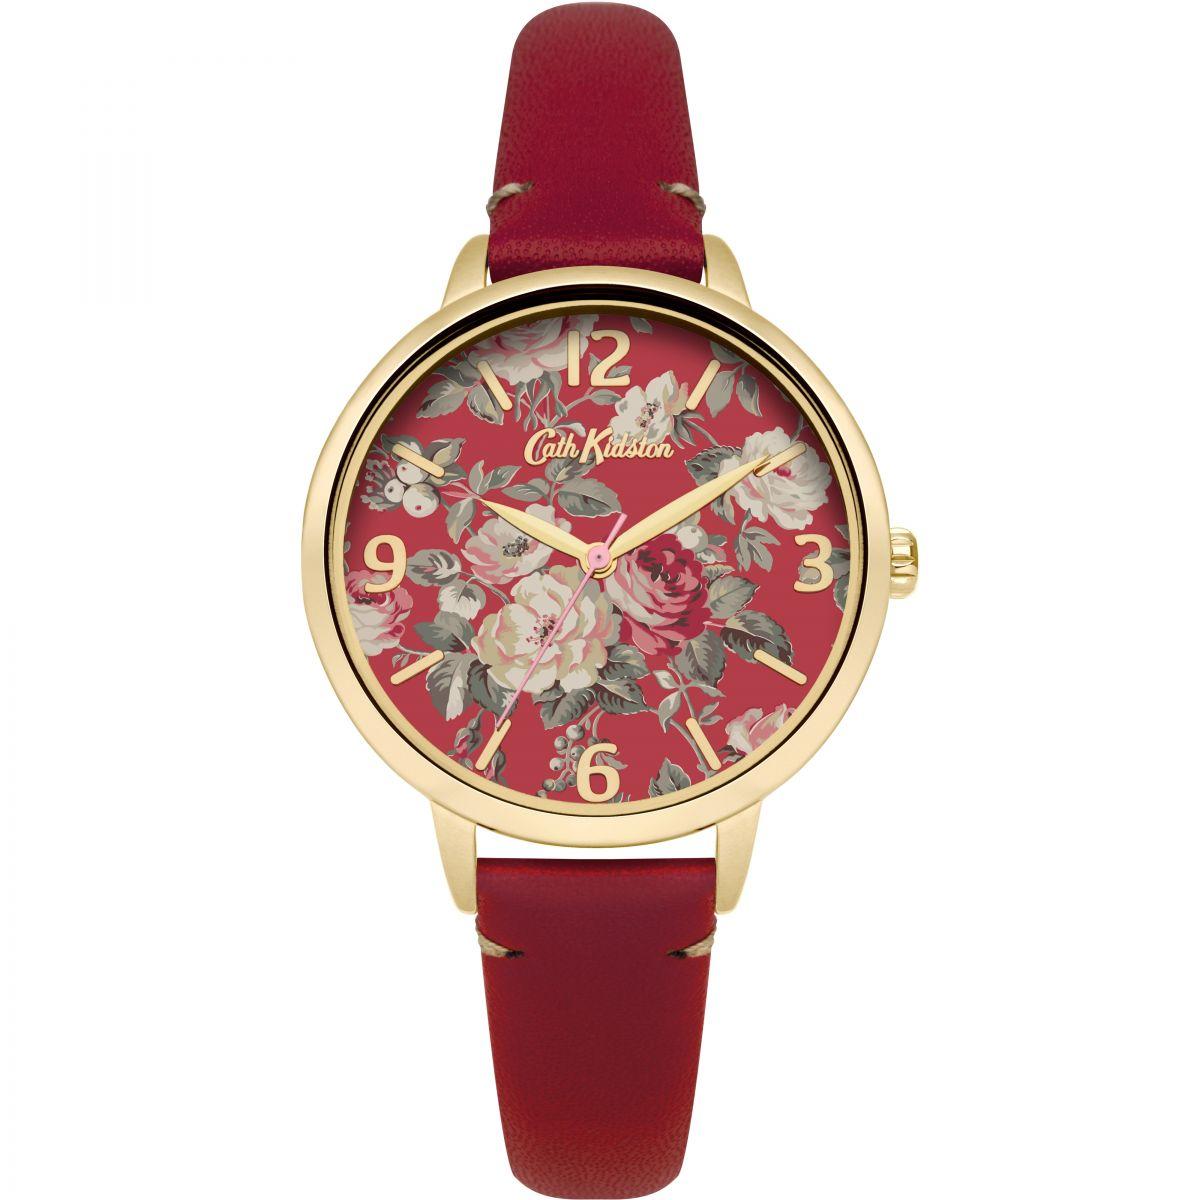 damen cath kidston garten rose rot leder armband uhren ckl001rg. Black Bedroom Furniture Sets. Home Design Ideas